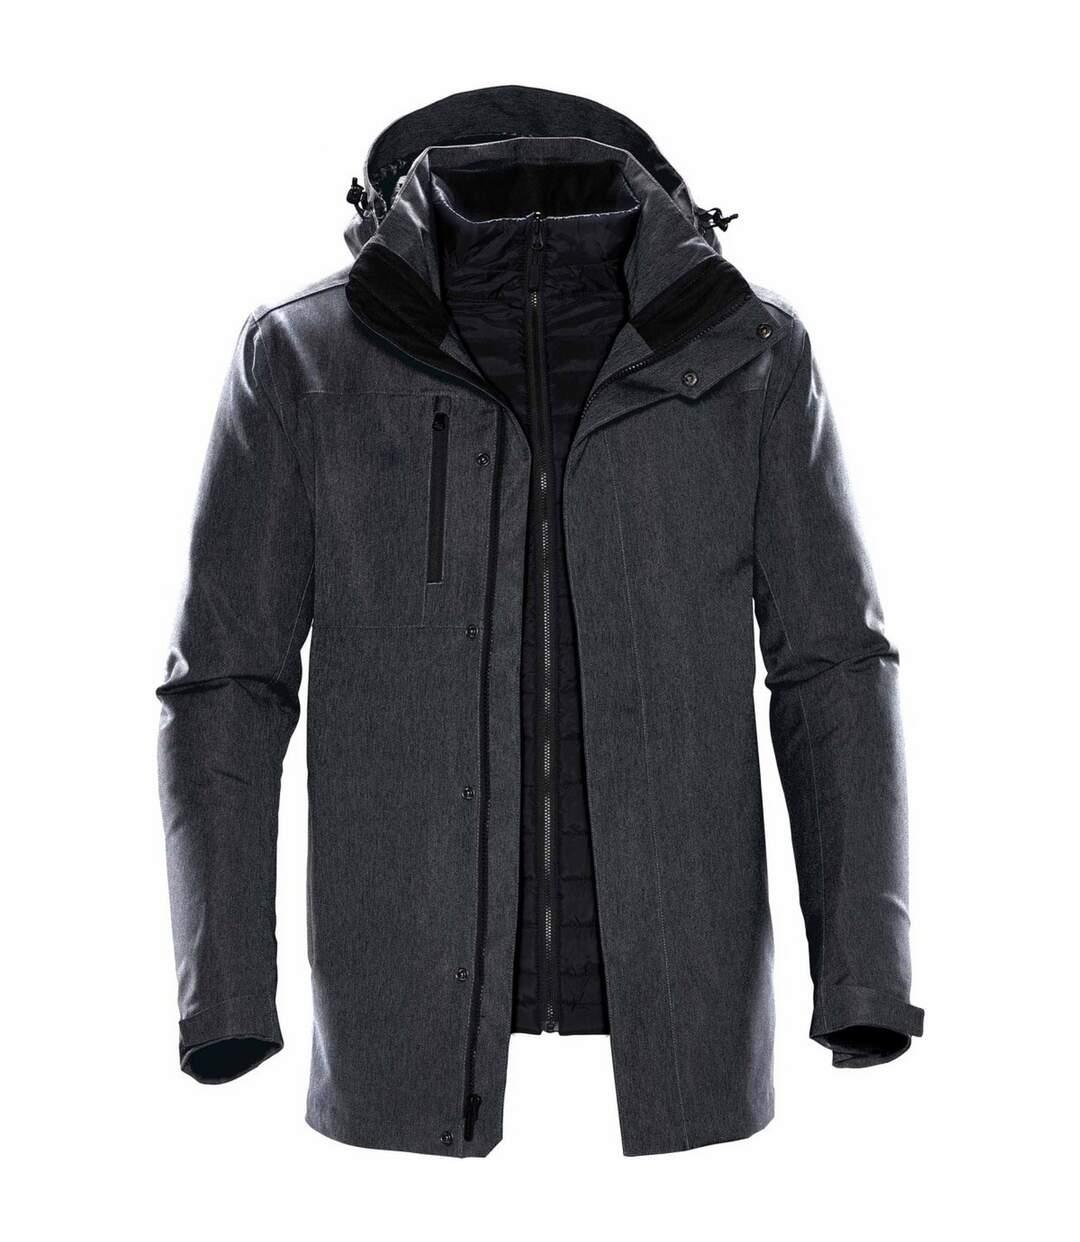 Stormtech Mens Avalanche System Jacket (Black) - UTBC4117